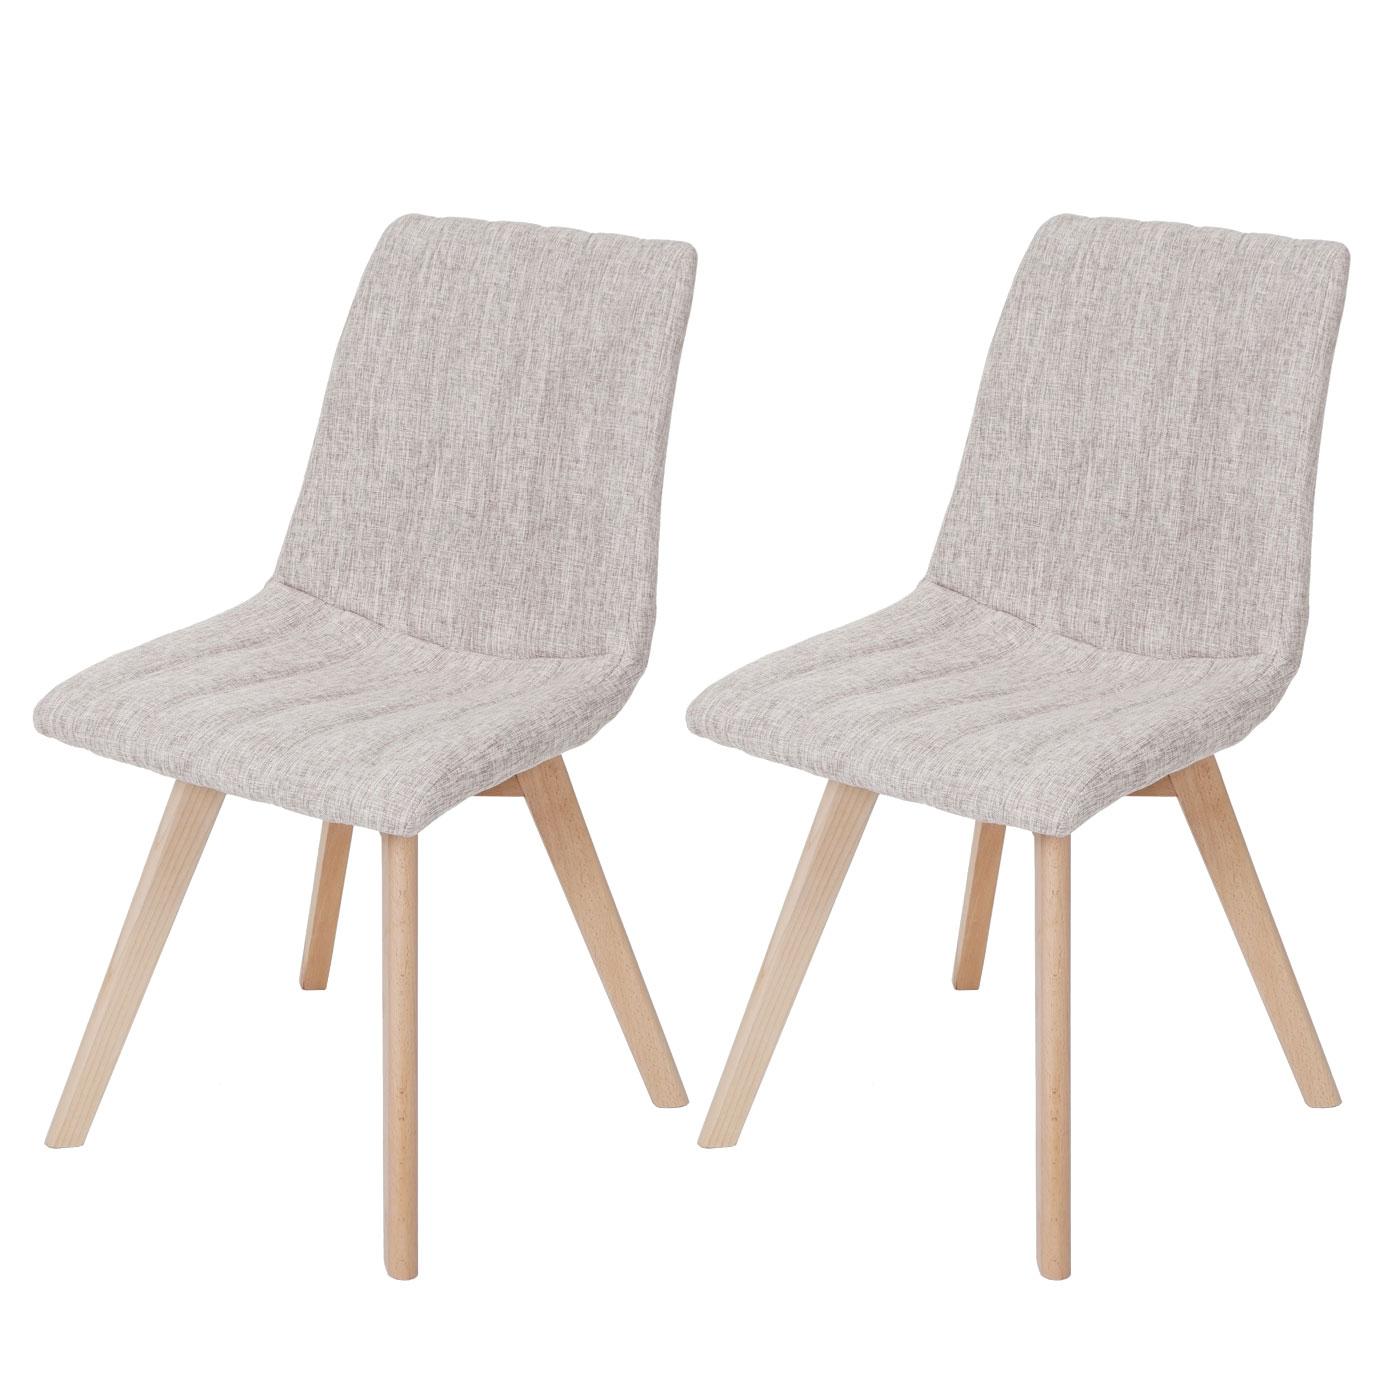 Set 2x sedie sala da pranzo calgary design anni 50 tessuto - Sedie design anni 50 ...